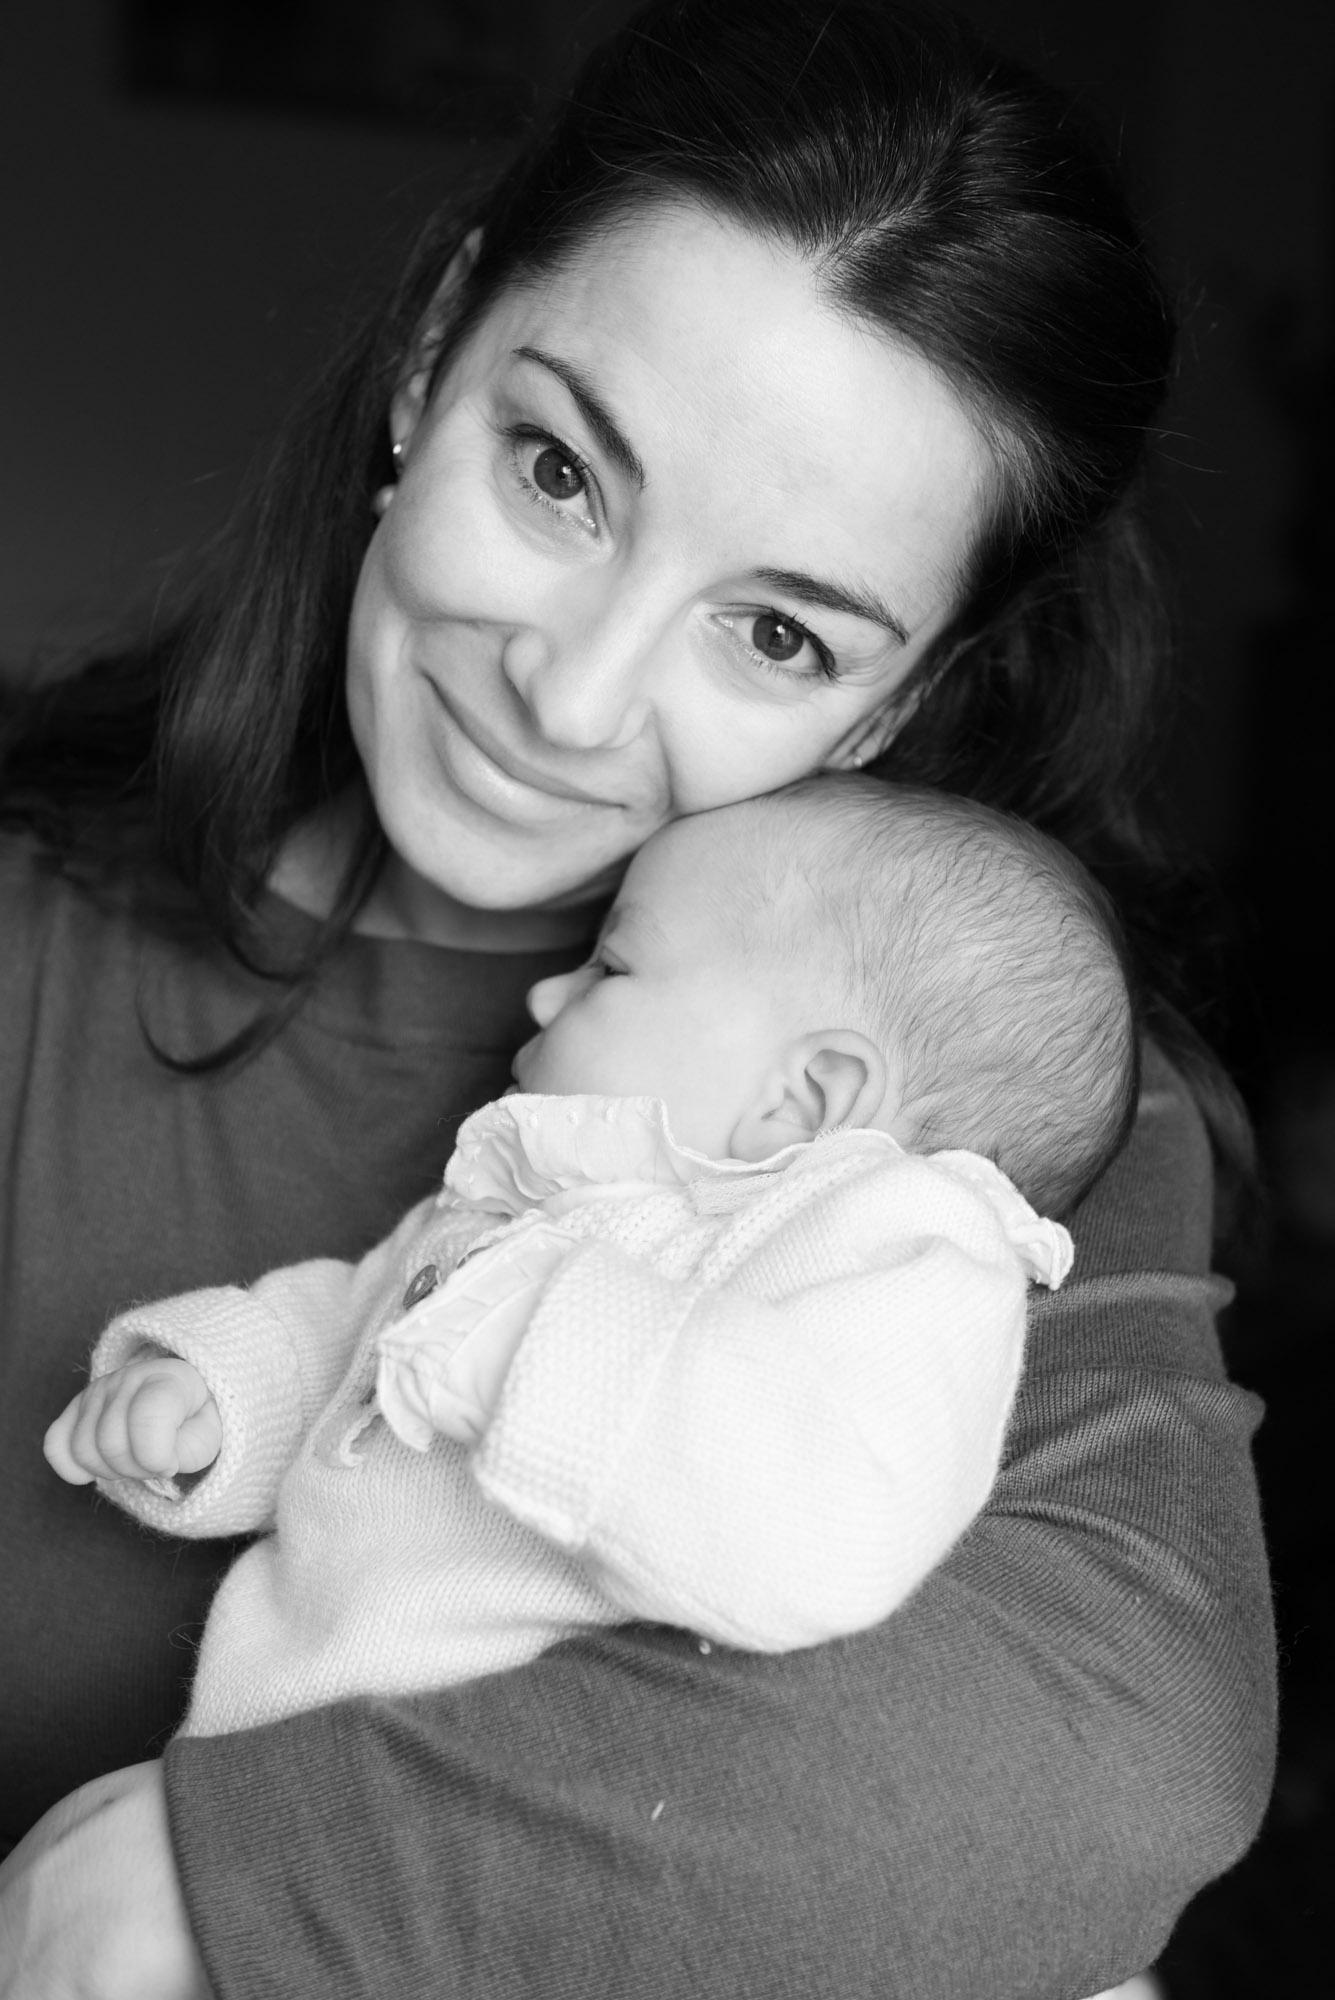 Sesión bebé familiar en domicilio particular-Retrato de mamá con bebé en brazos-asestelo